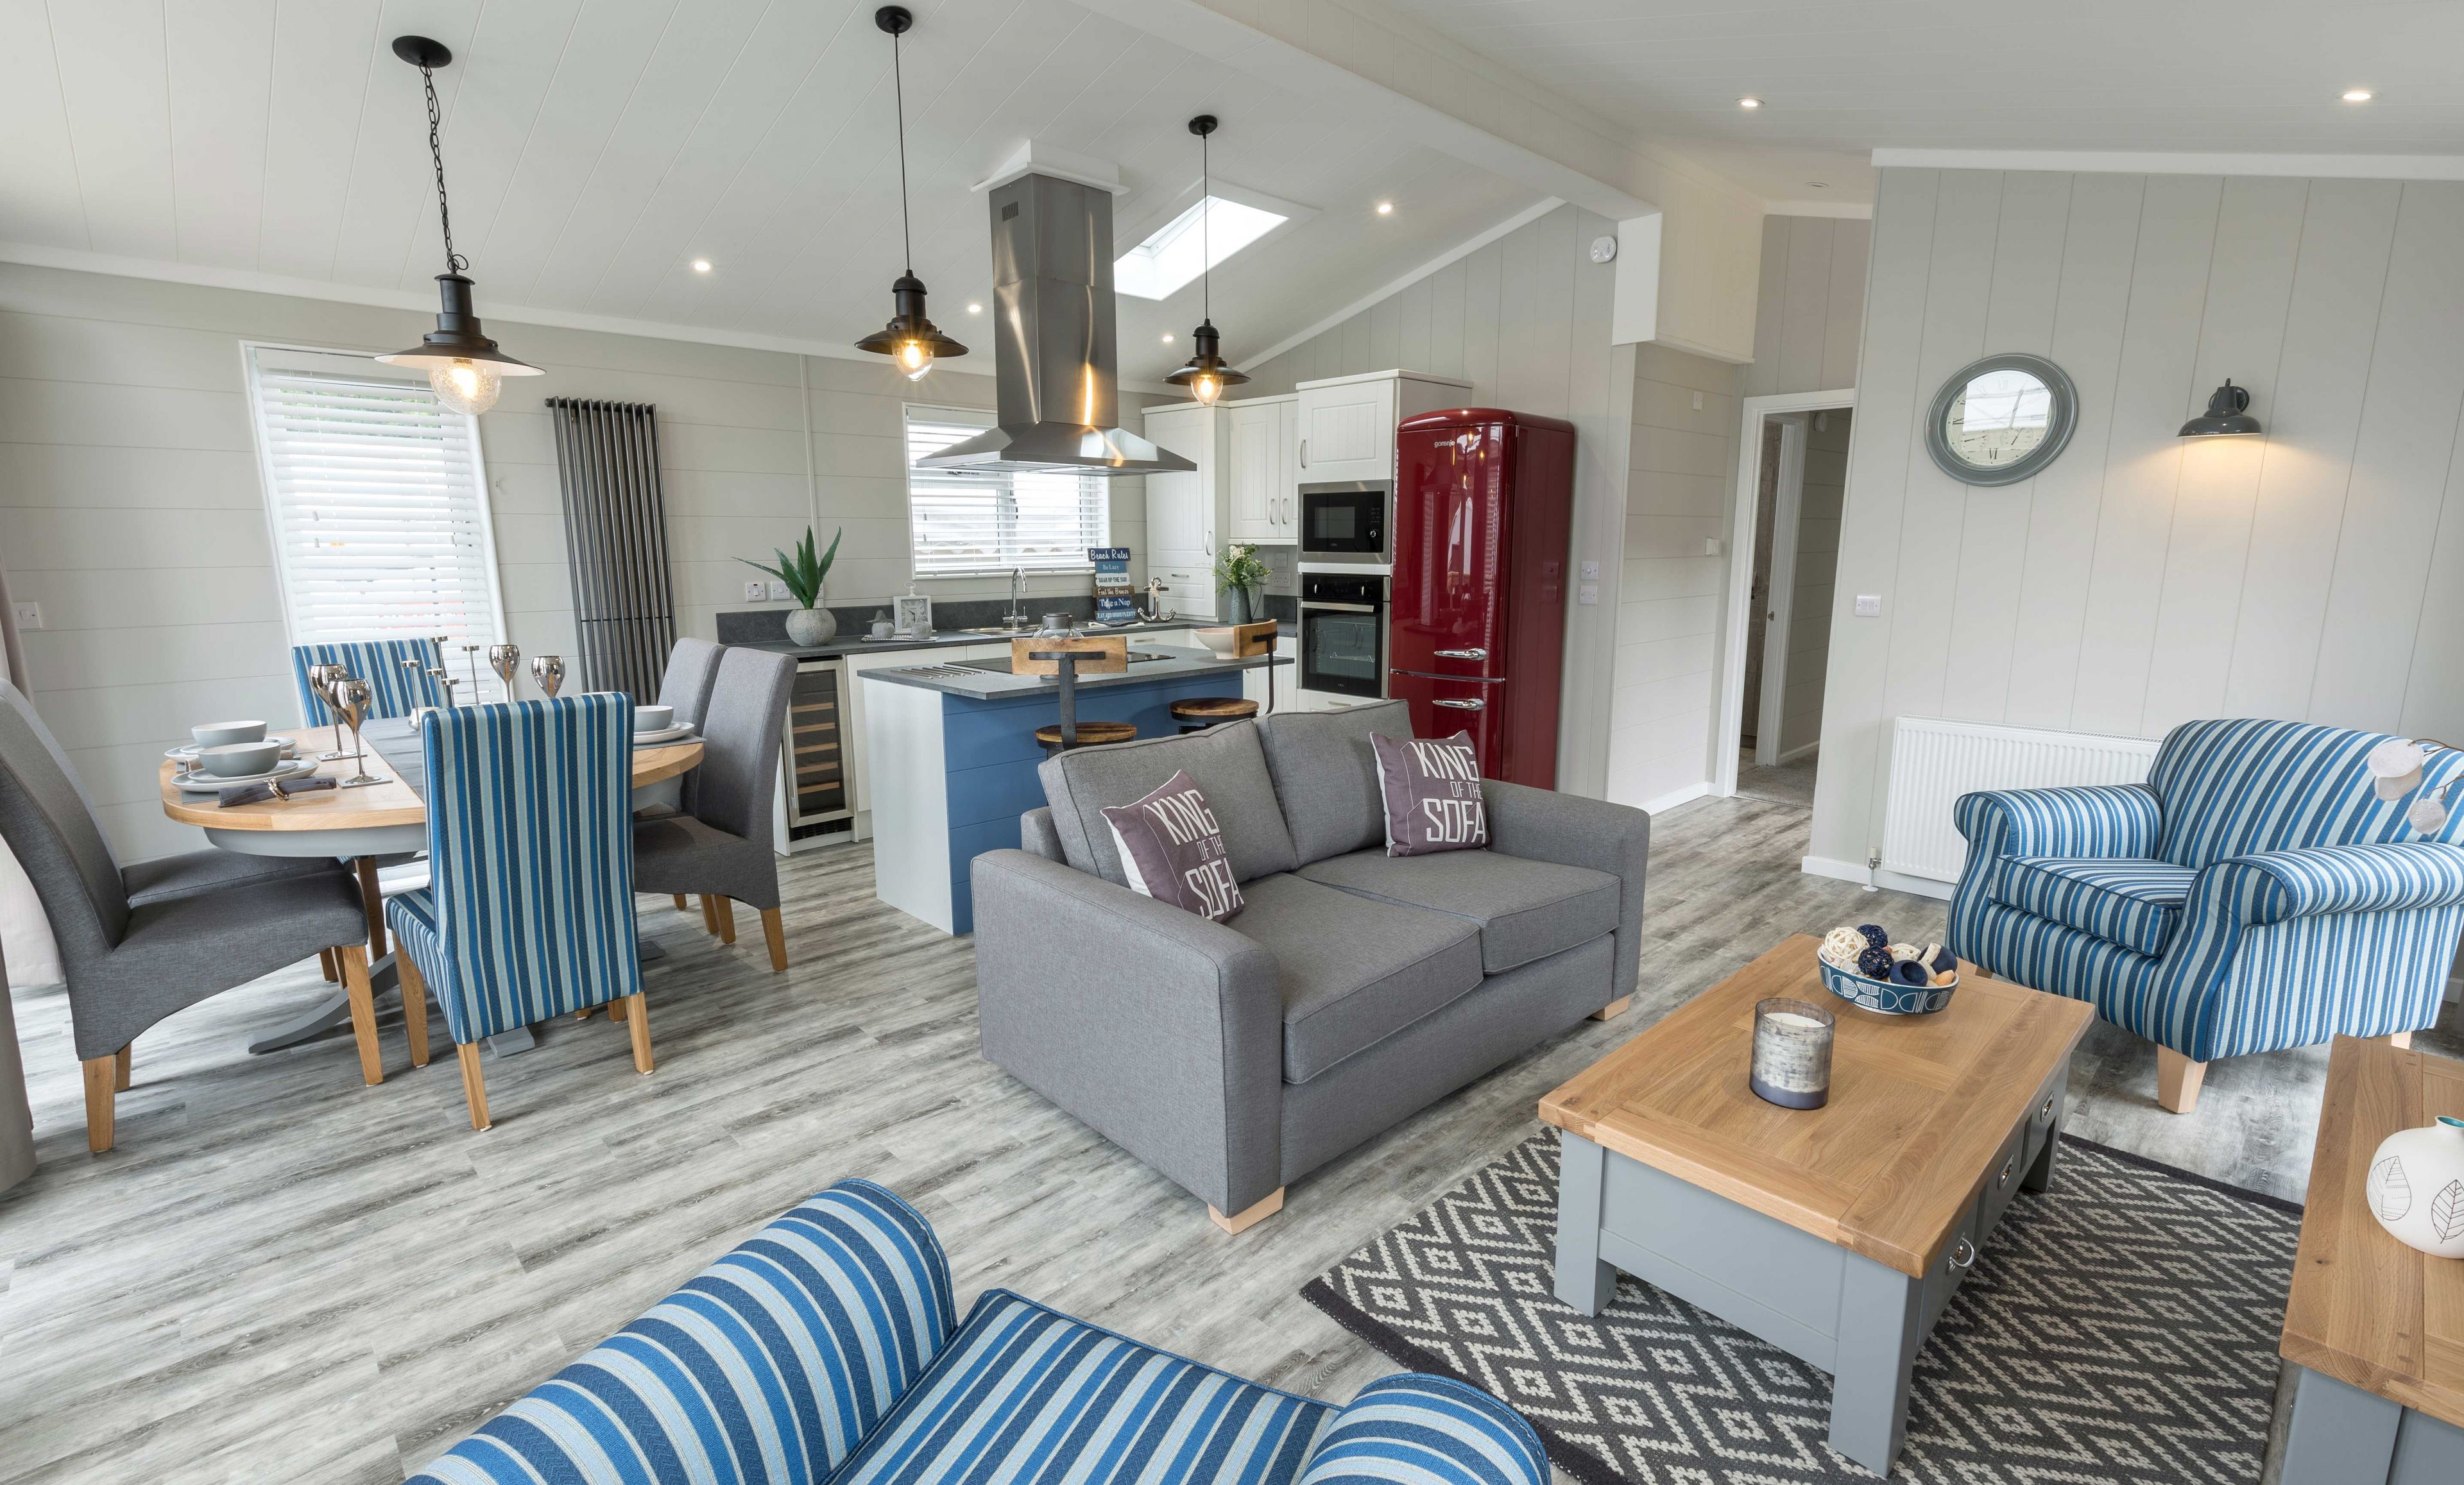 The Country Lodge - Coastal Lounge